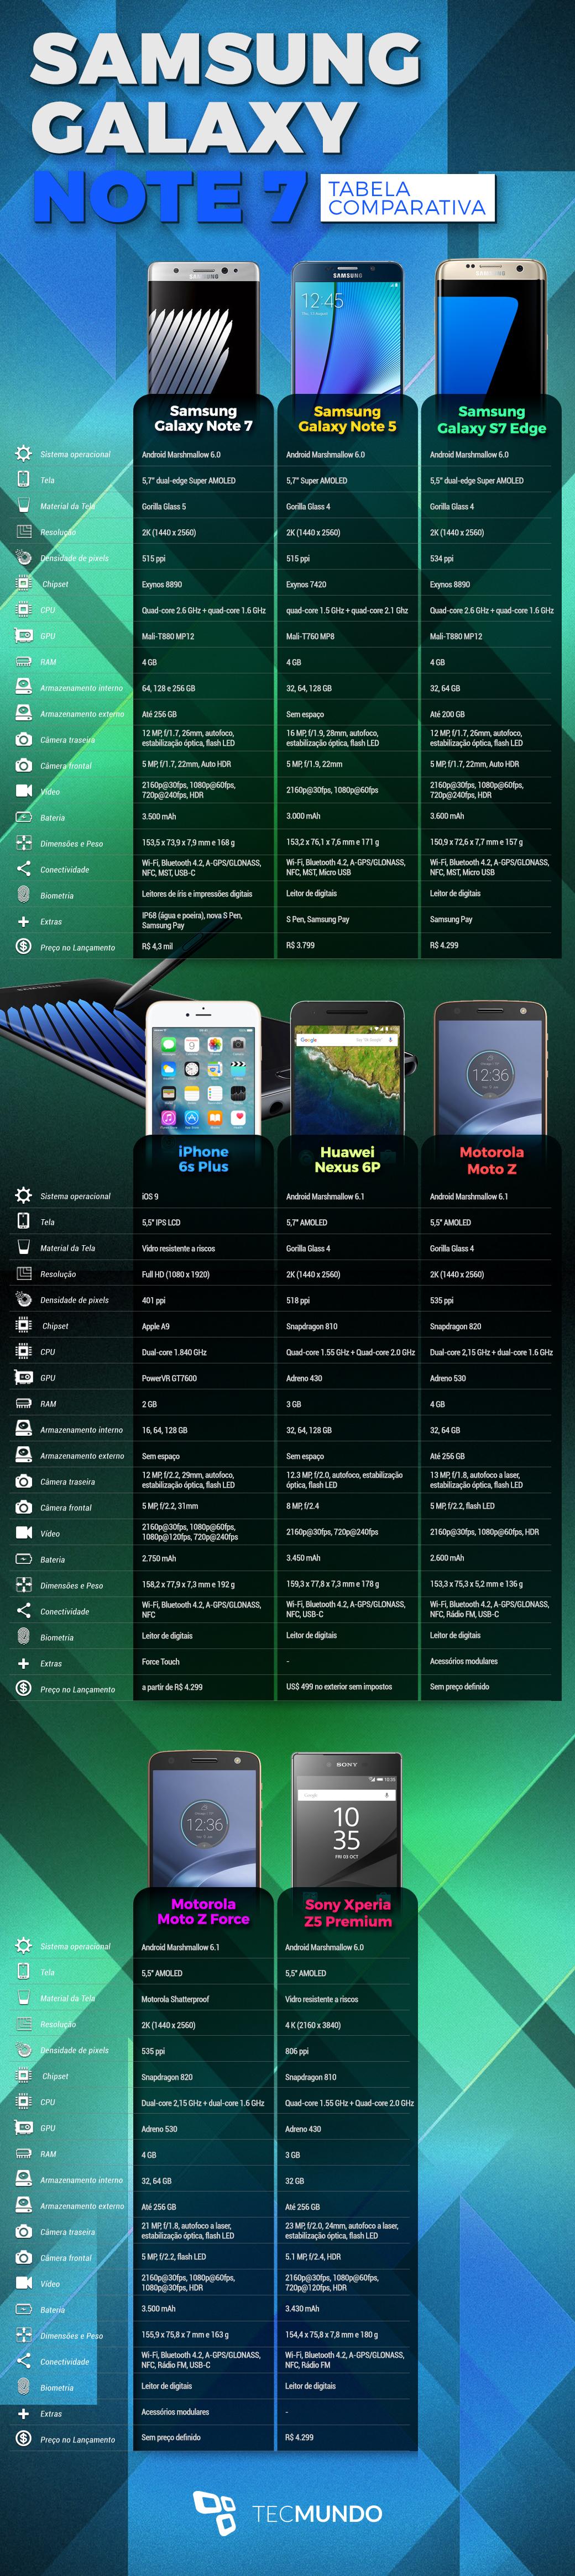 Comparativo: Galaxy Note 7 contra os principais concorrentes